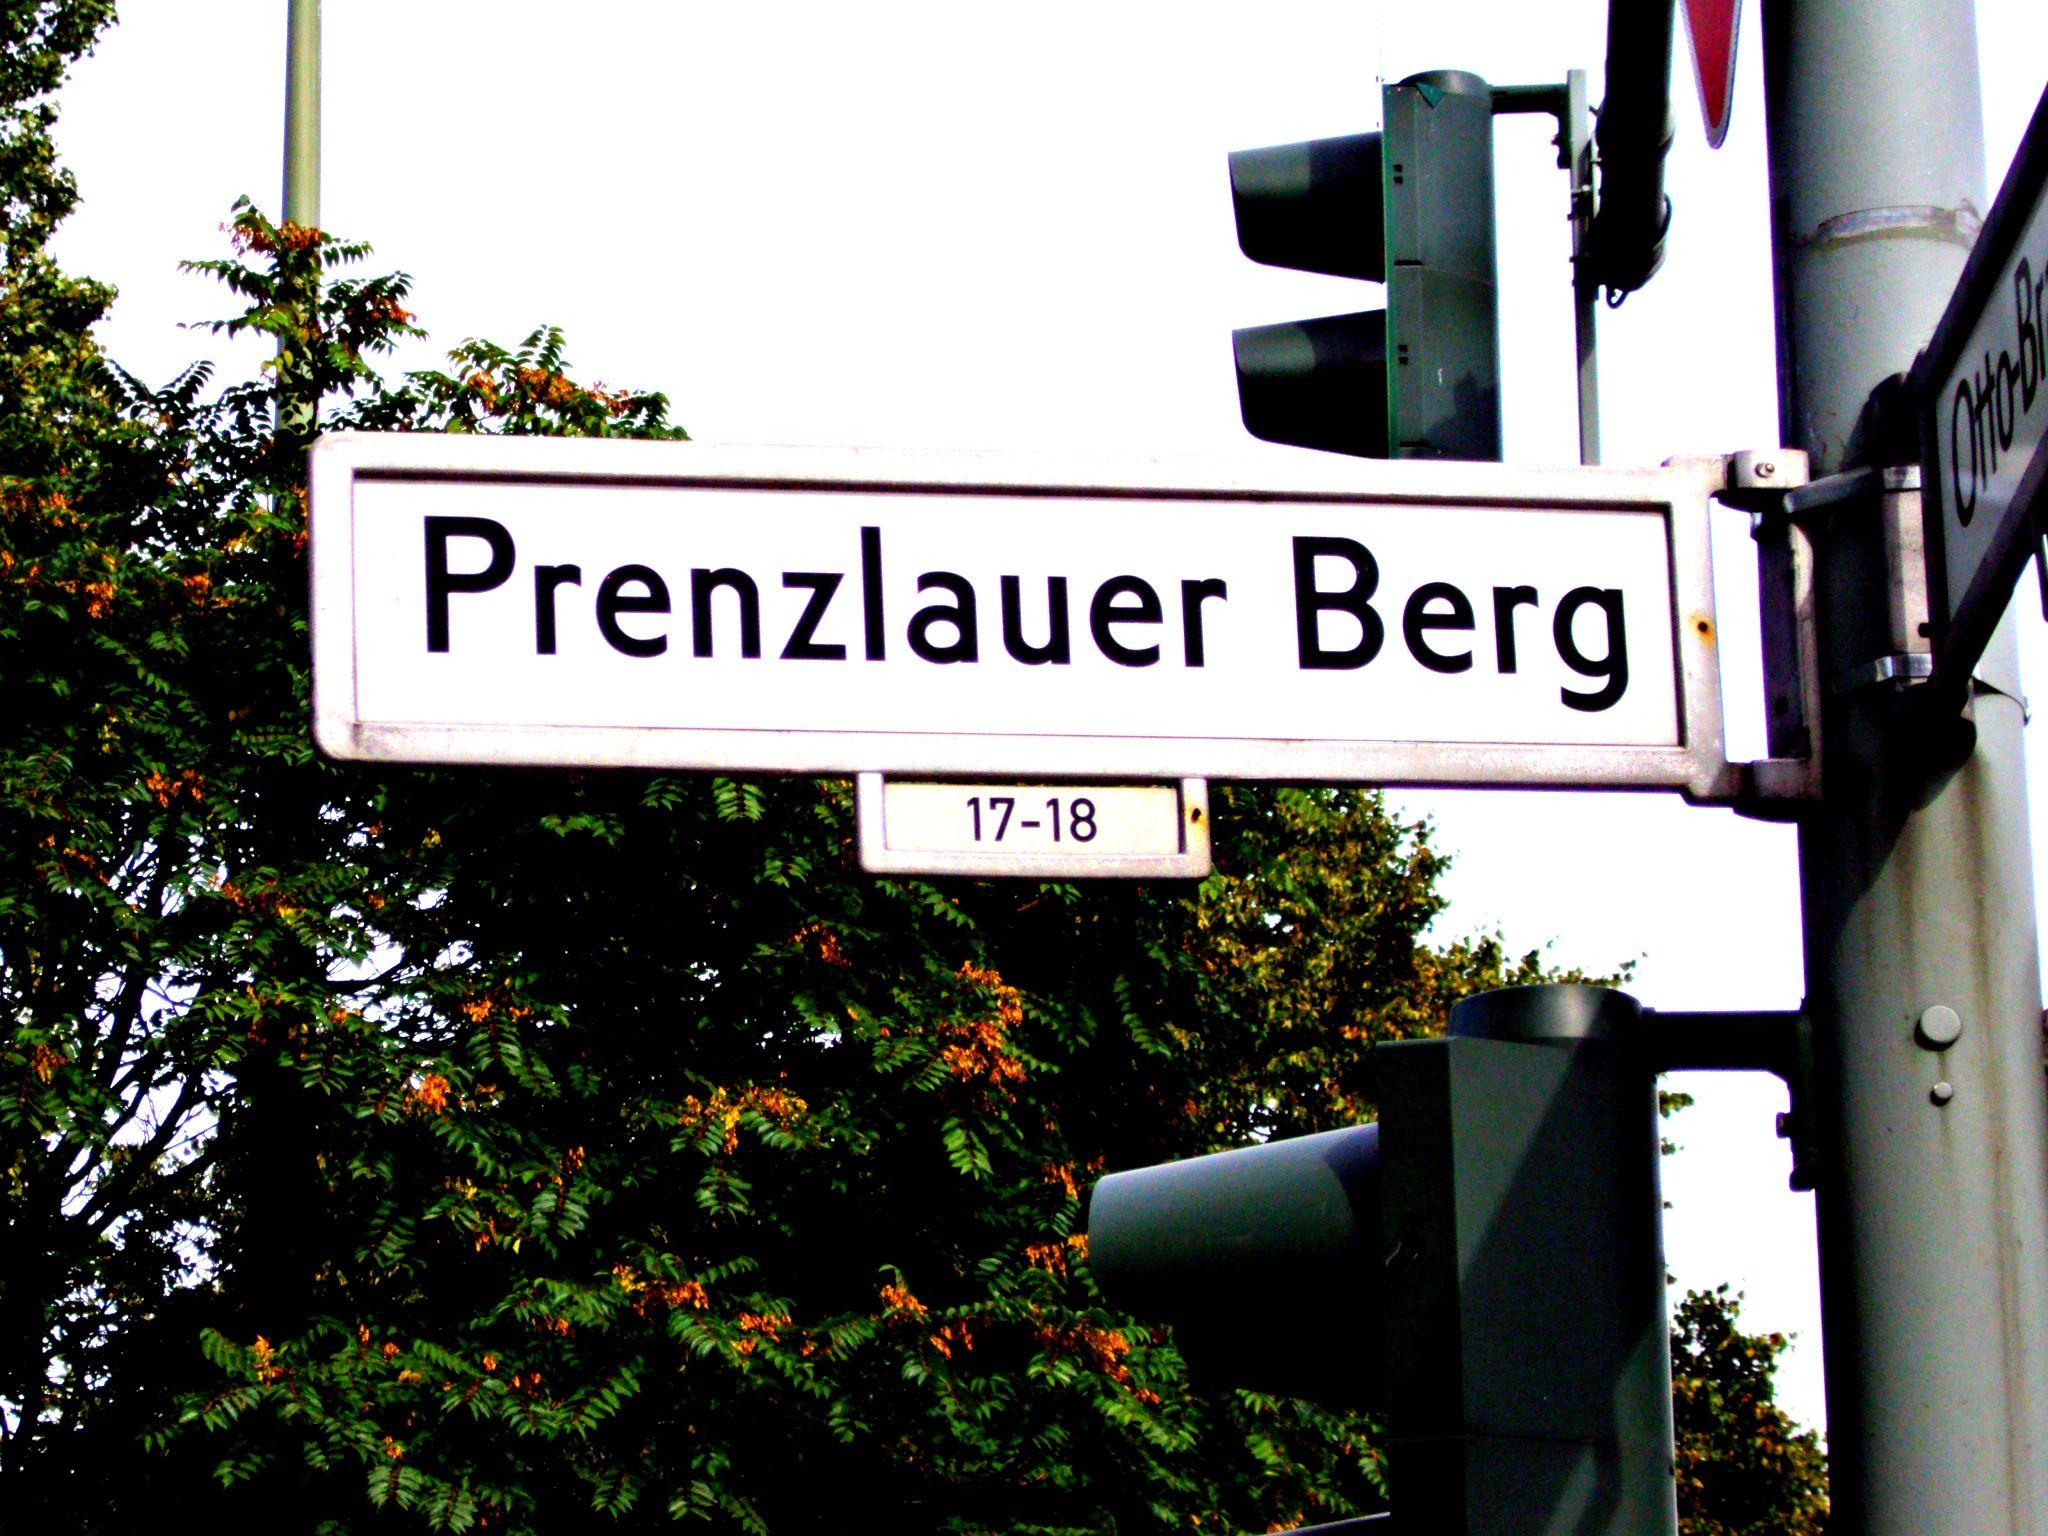 ohne worte berlin prenzlauer berg my favorite places pinterest berlin places und places. Black Bedroom Furniture Sets. Home Design Ideas